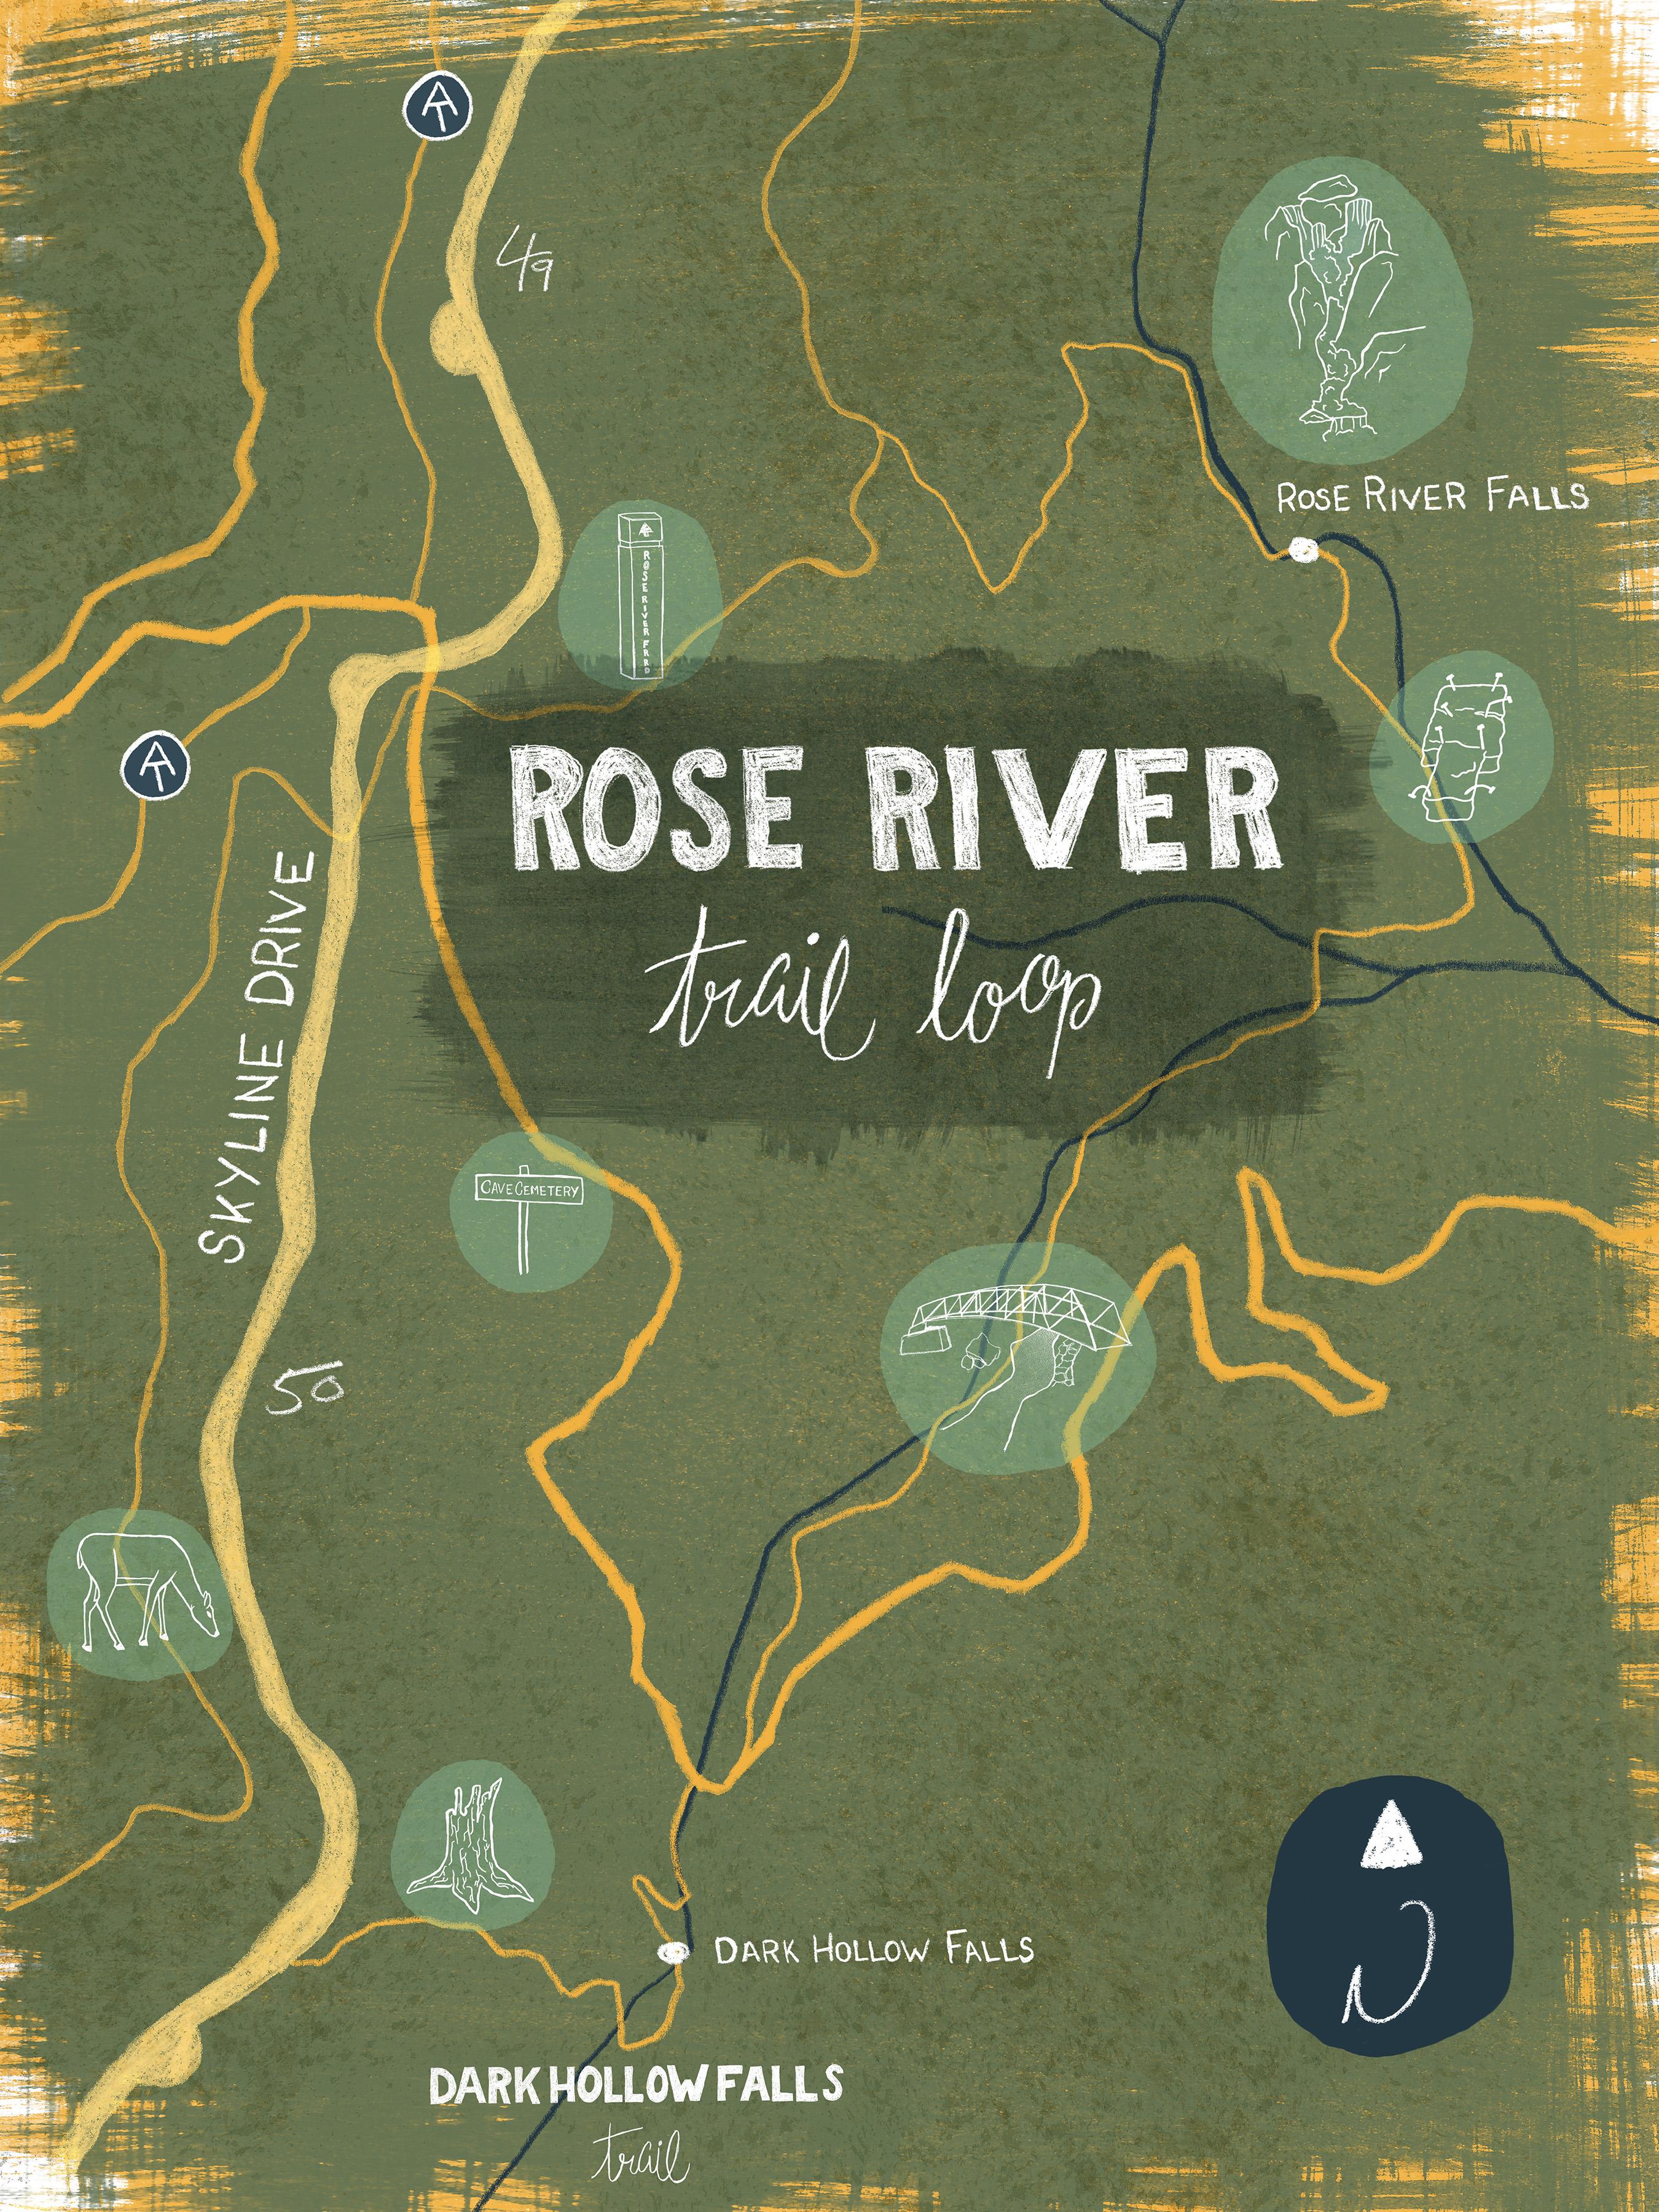 RoseRiverMap2-online